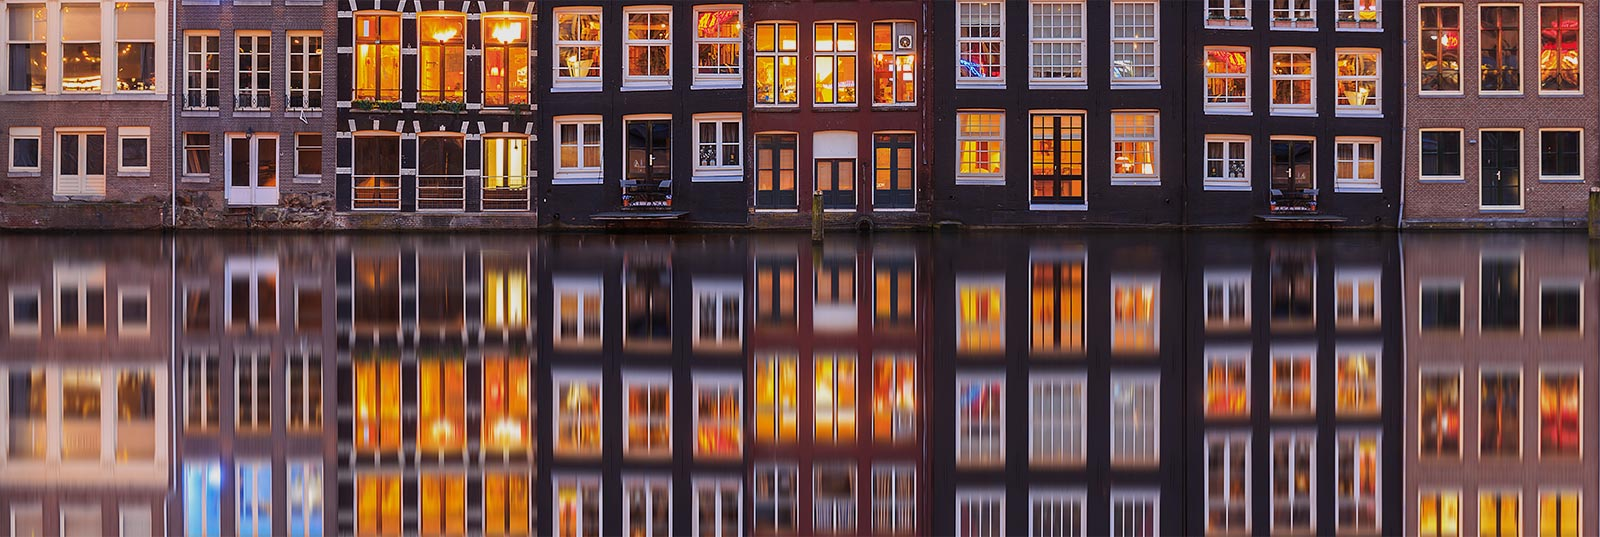 Guía turística de Amsterdam